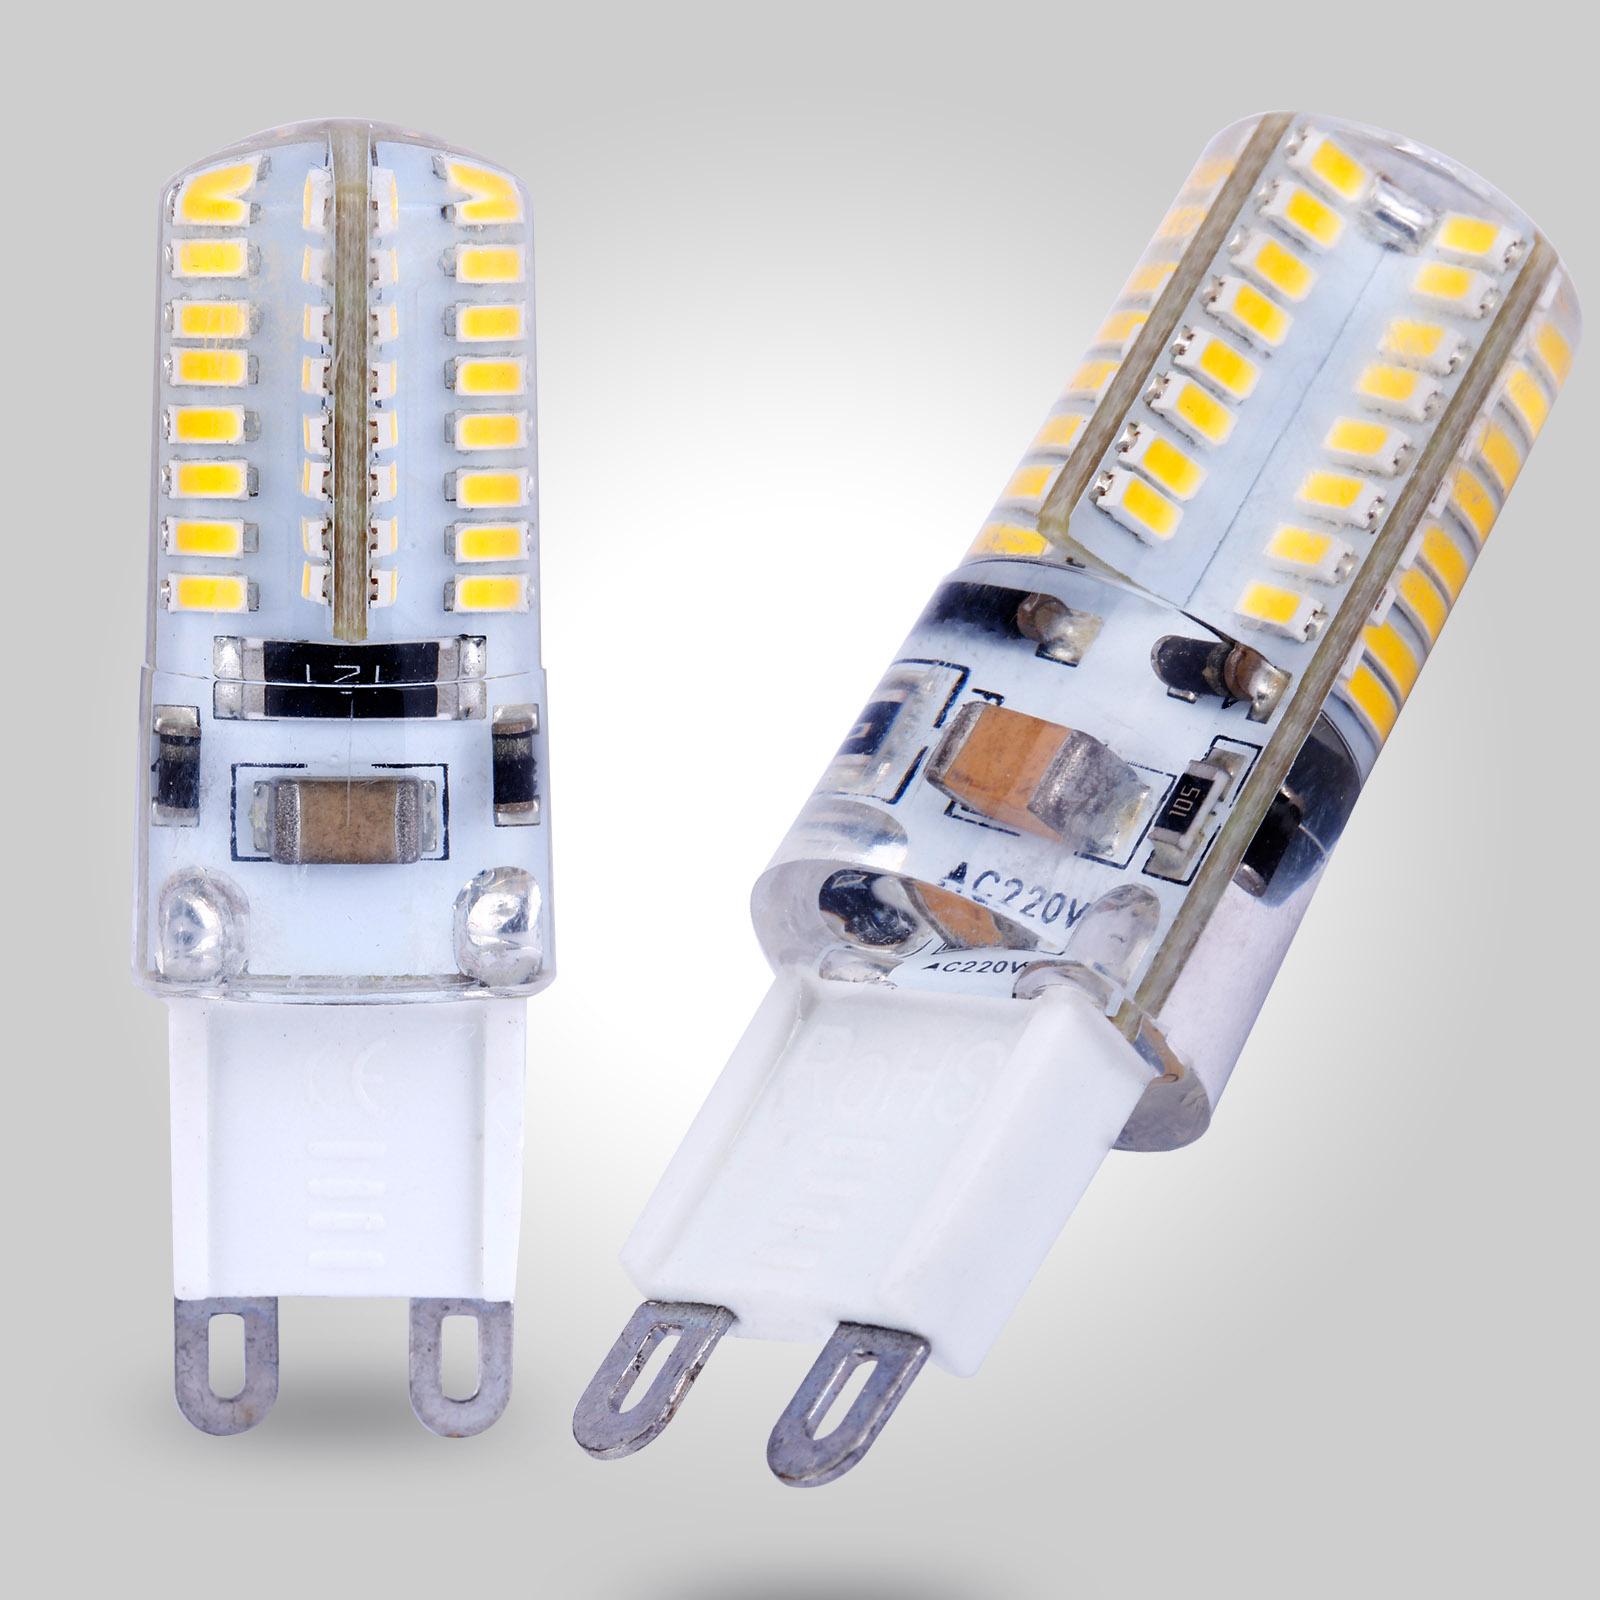 5x 3w led ampoules jaune chaud 64 led lampe decoration eclairage lumiere cafe ebay. Black Bedroom Furniture Sets. Home Design Ideas